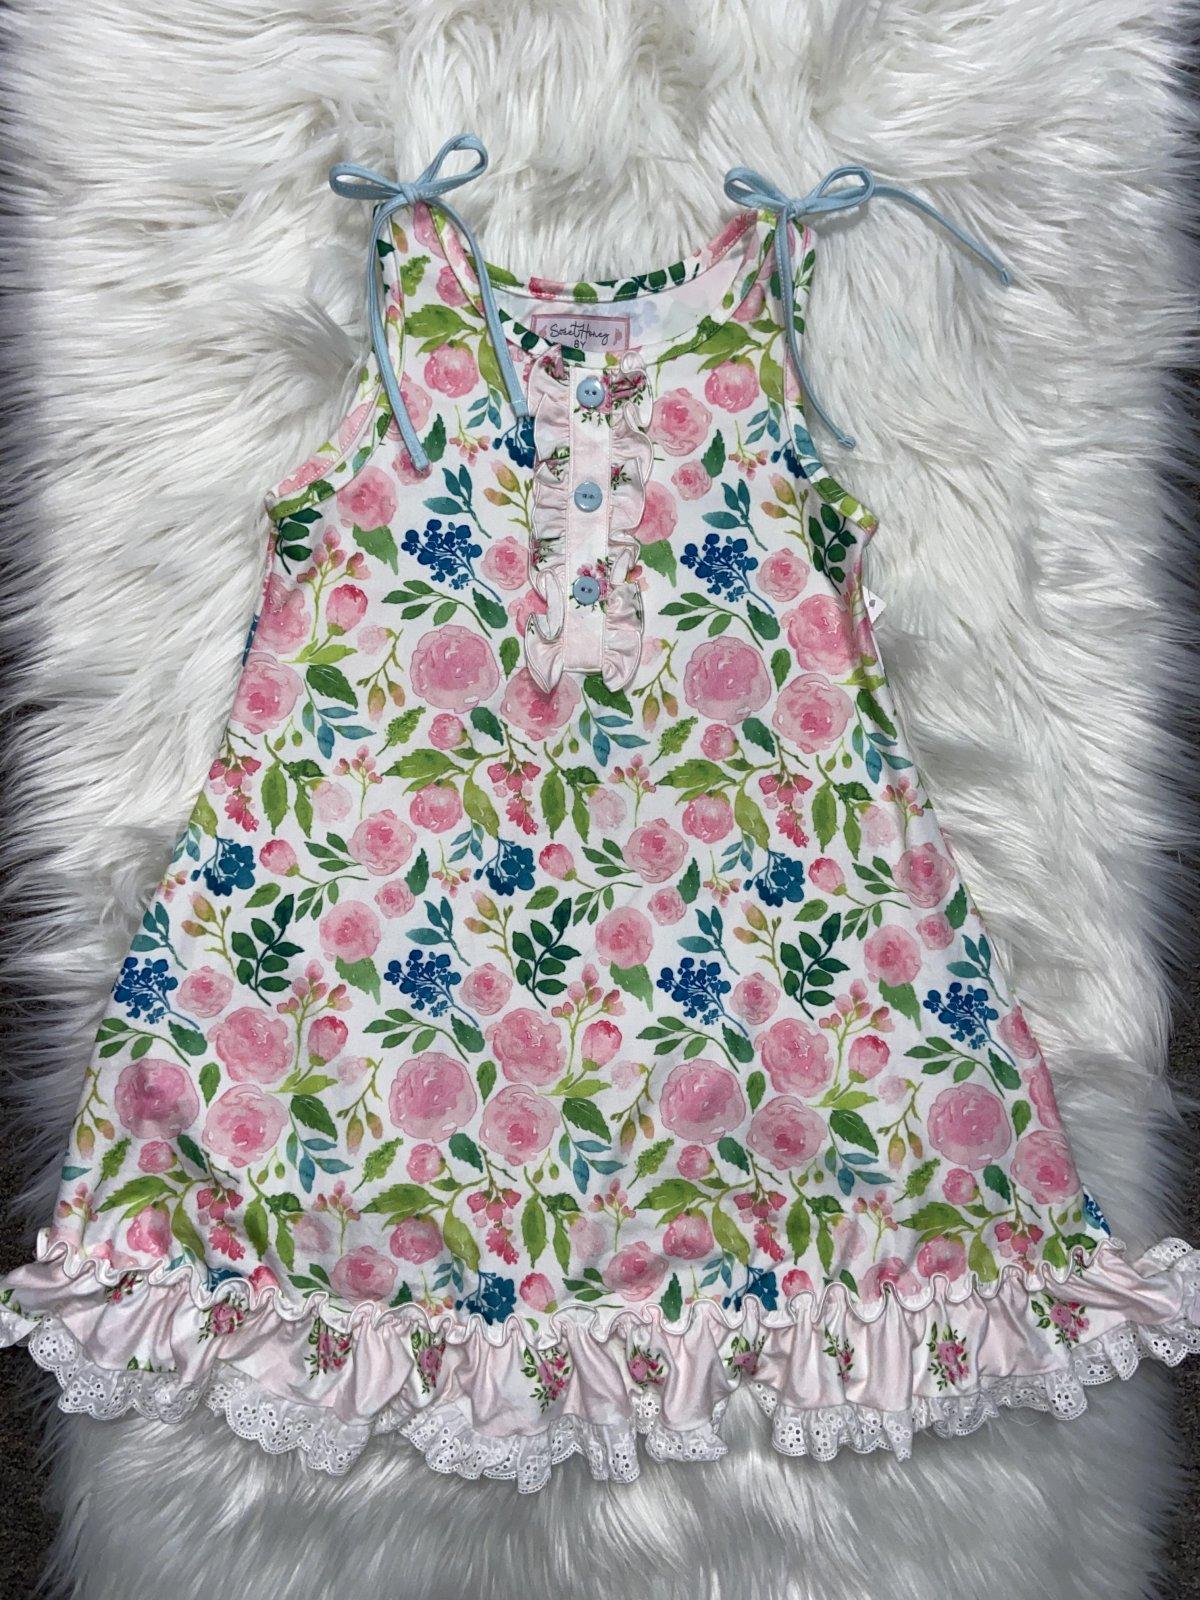 SWEET HONEY NS DRESS PINK FLORAL SIZE 8